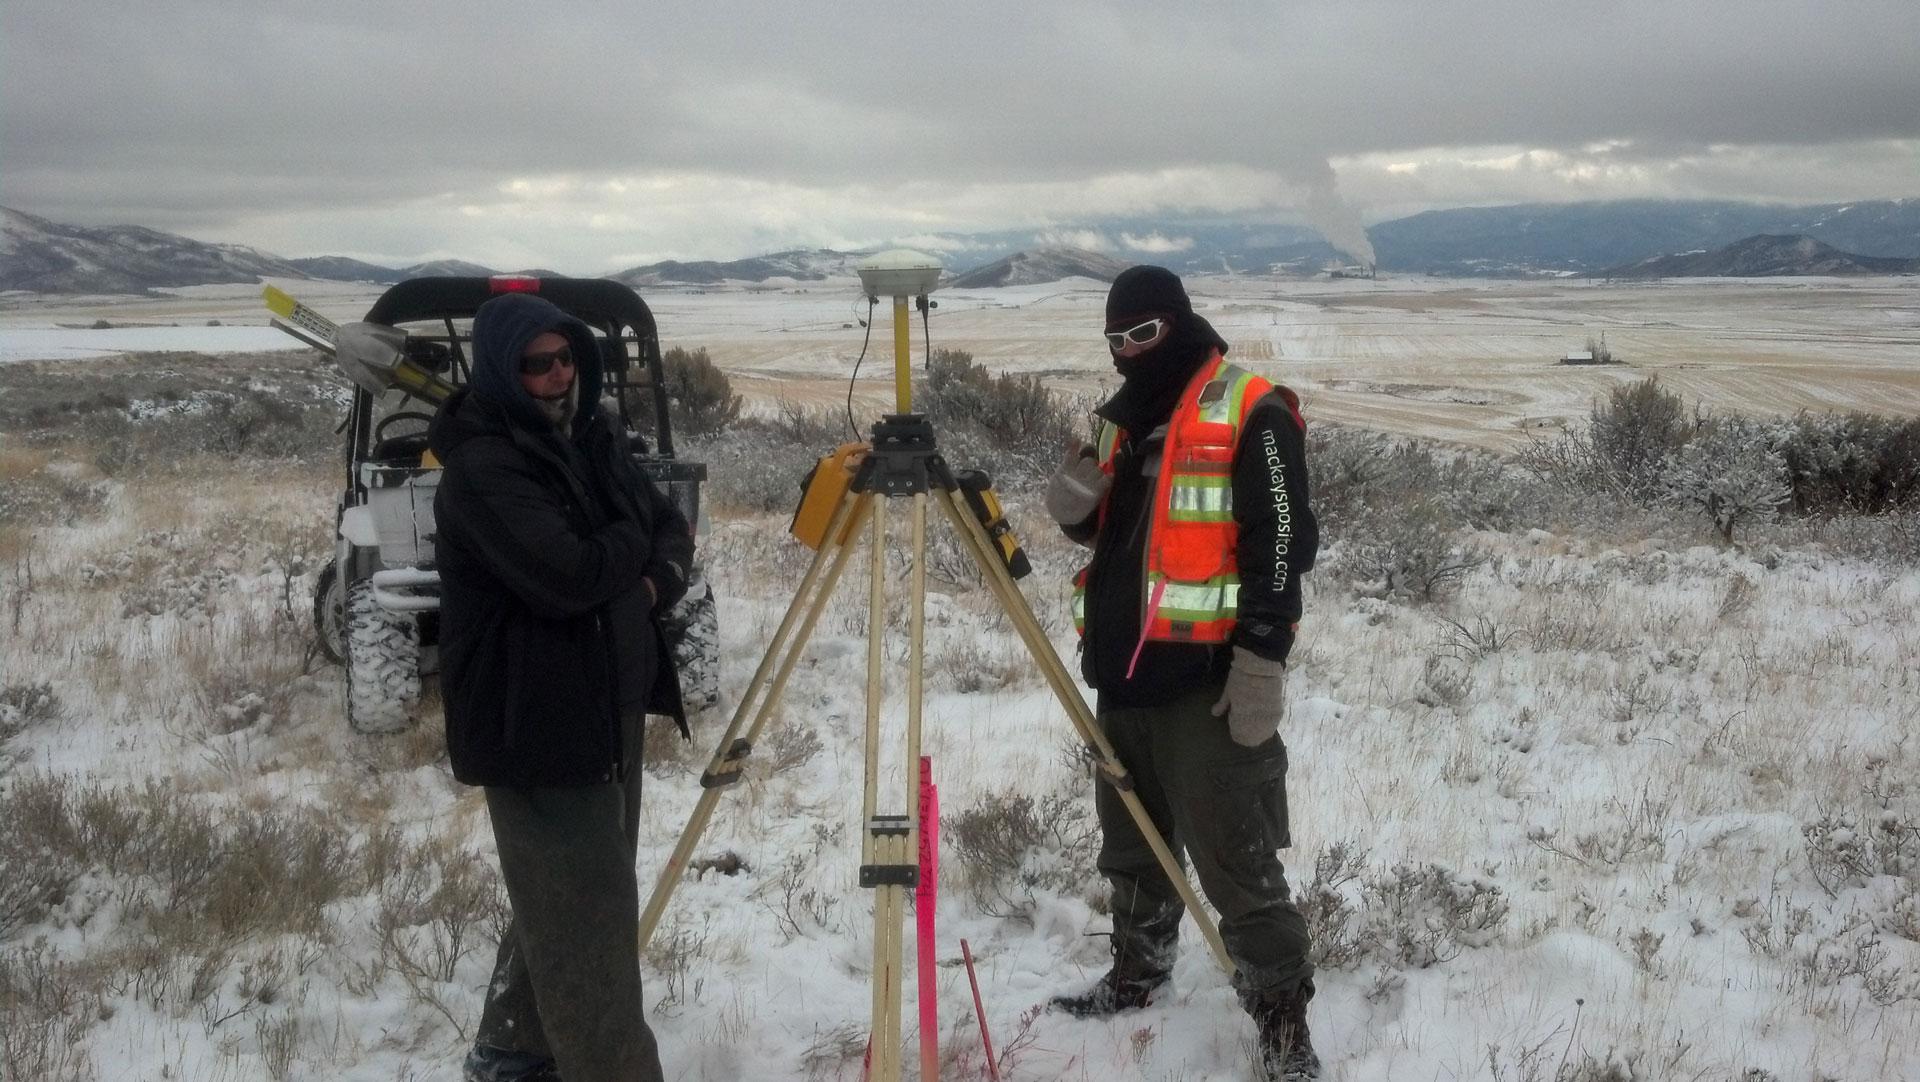 Land-Surveying---Lead-Image---1920x1082.jpg